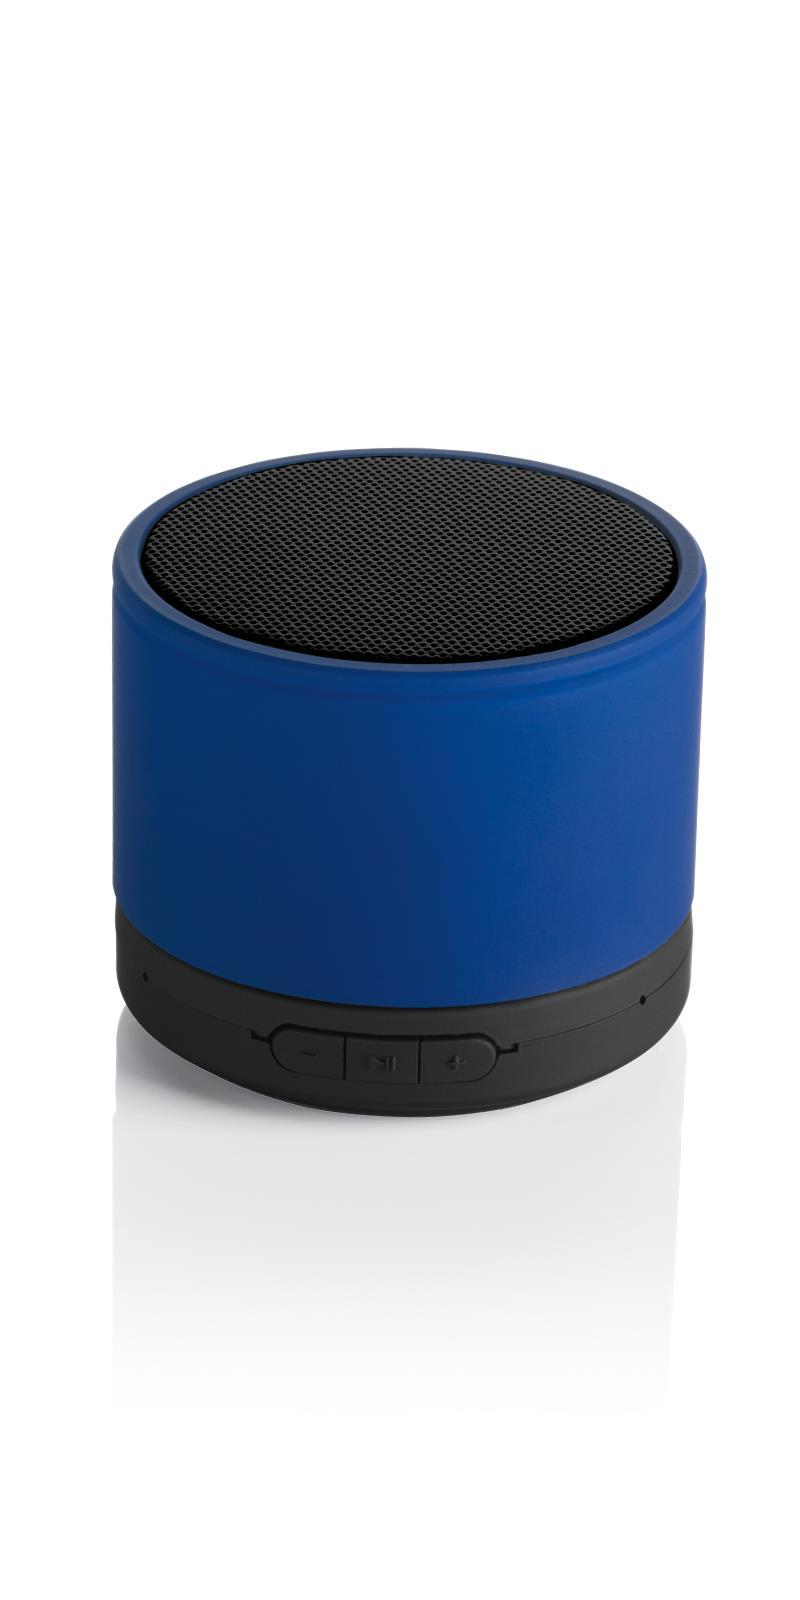 lautsprecher mini bluetooth farbig sbl 4 1 a1 blau soundbox b ware ebay. Black Bedroom Furniture Sets. Home Design Ideas